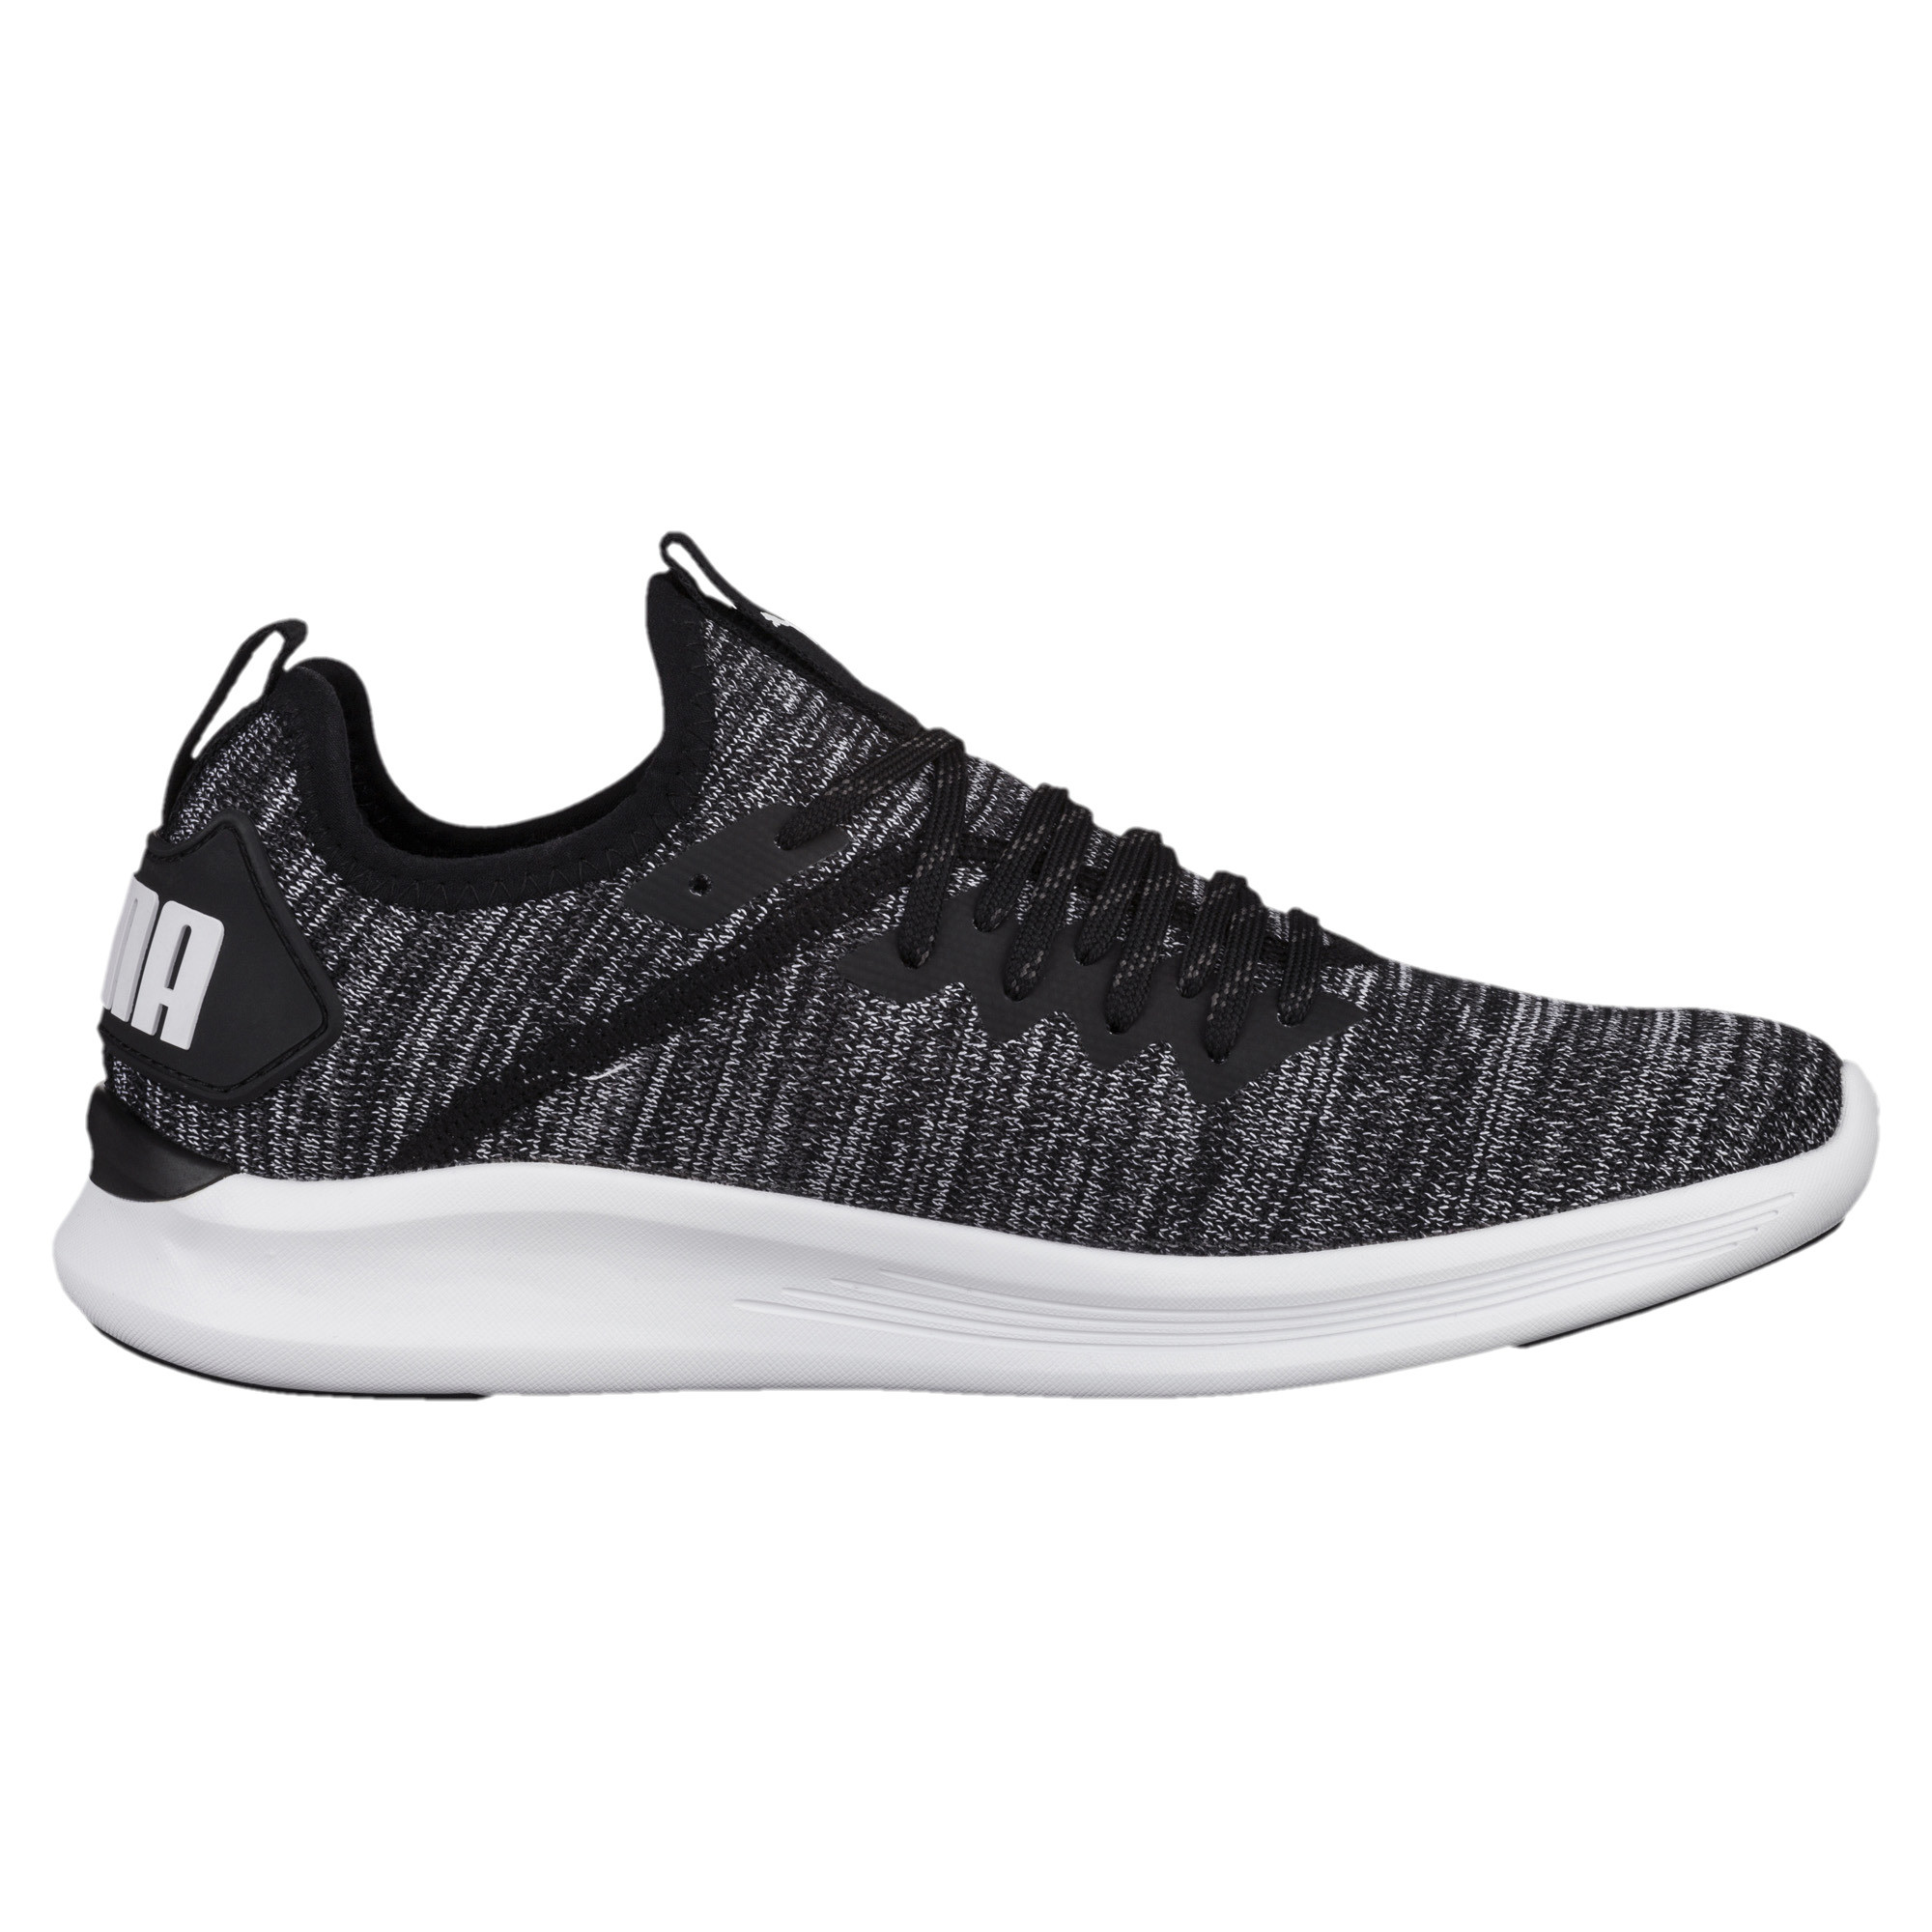 Image Puma IGNITE Flash evoKNIT Women's Running Shoes #3